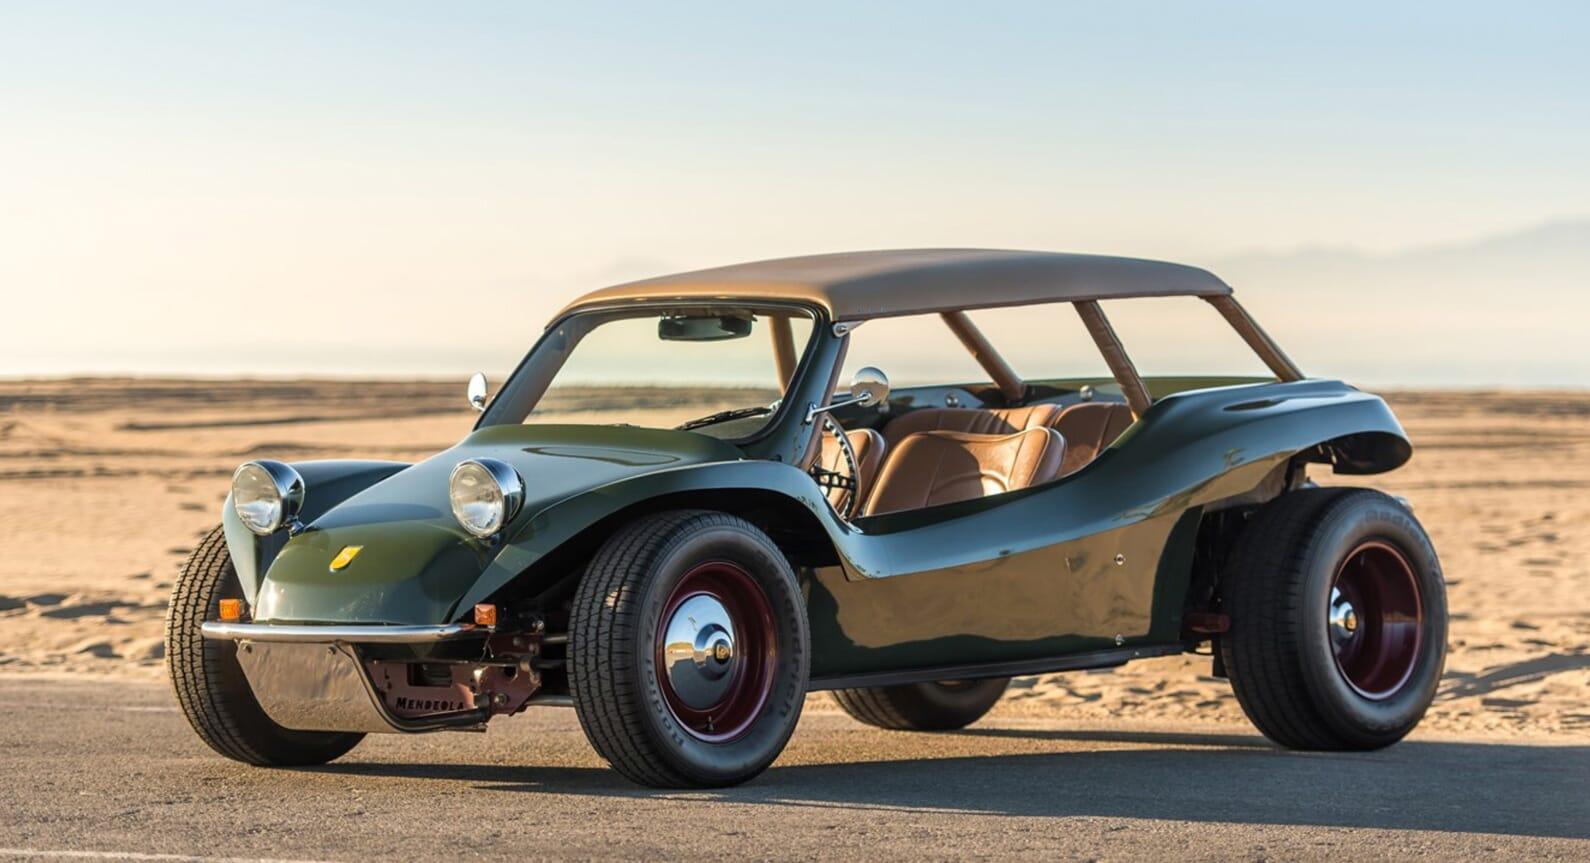 The Original American Dune Buggy: The 1965 Meyers Manxter 2+2